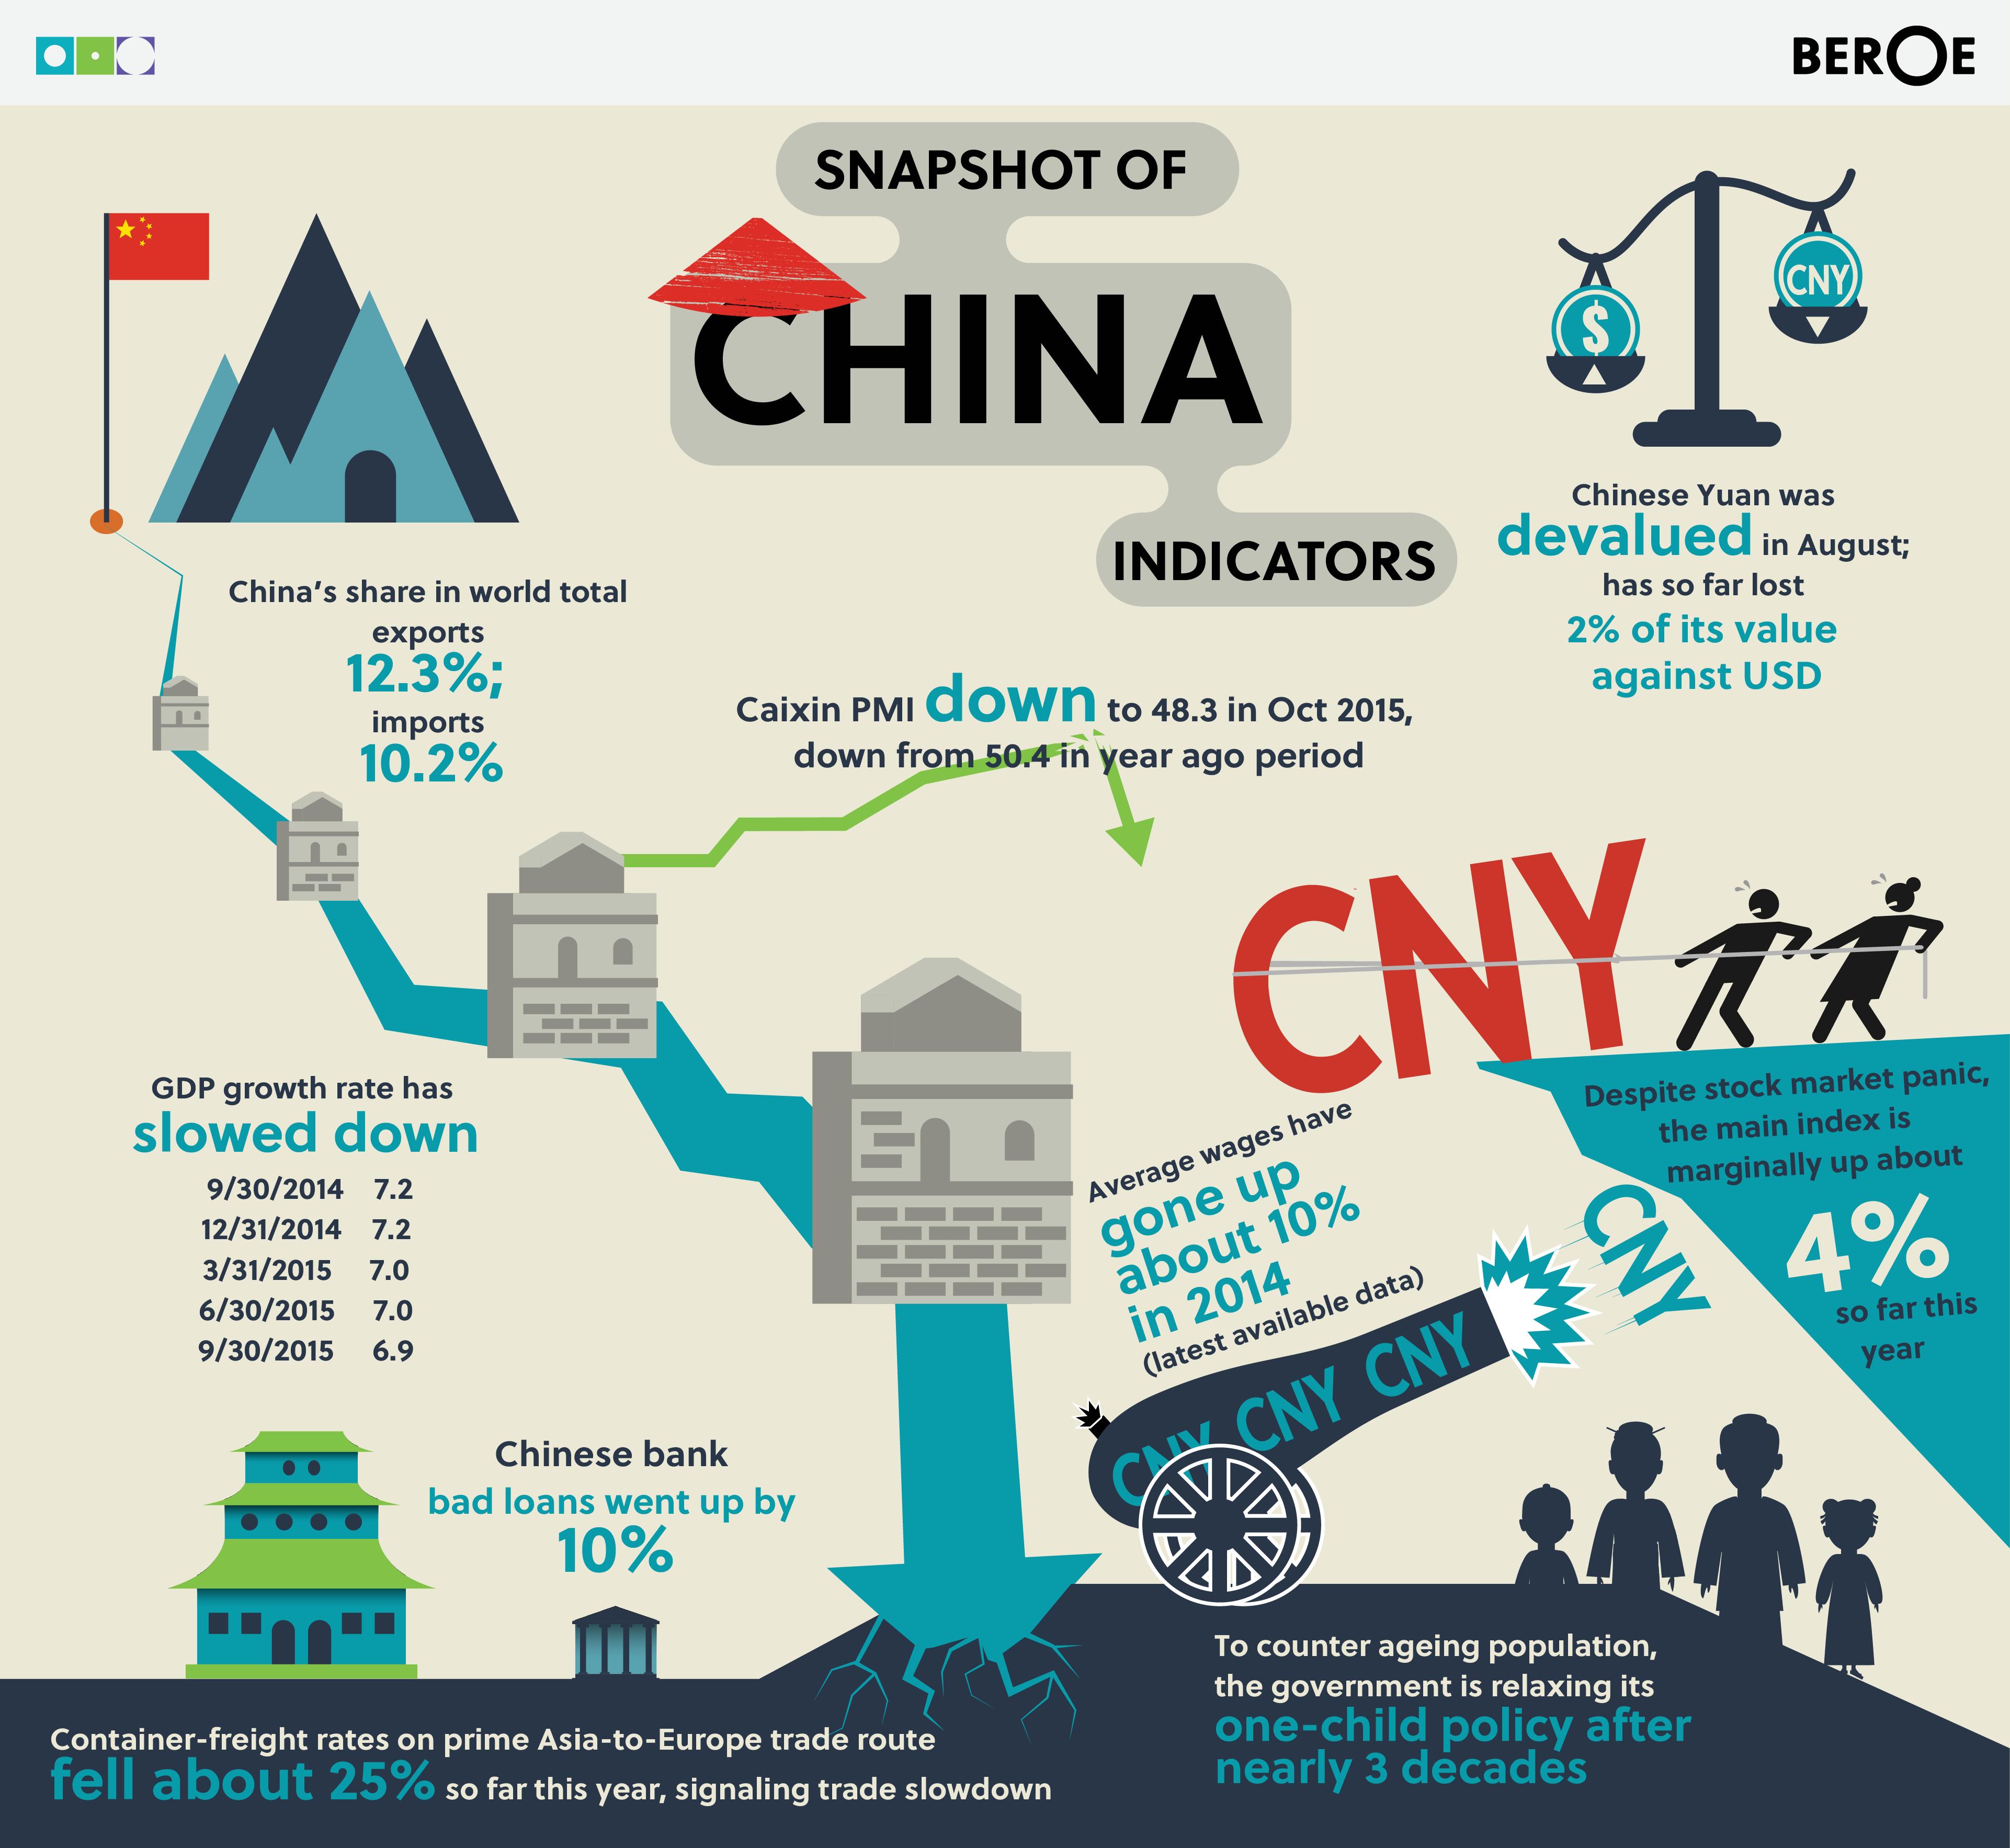 China - Economic Indicators